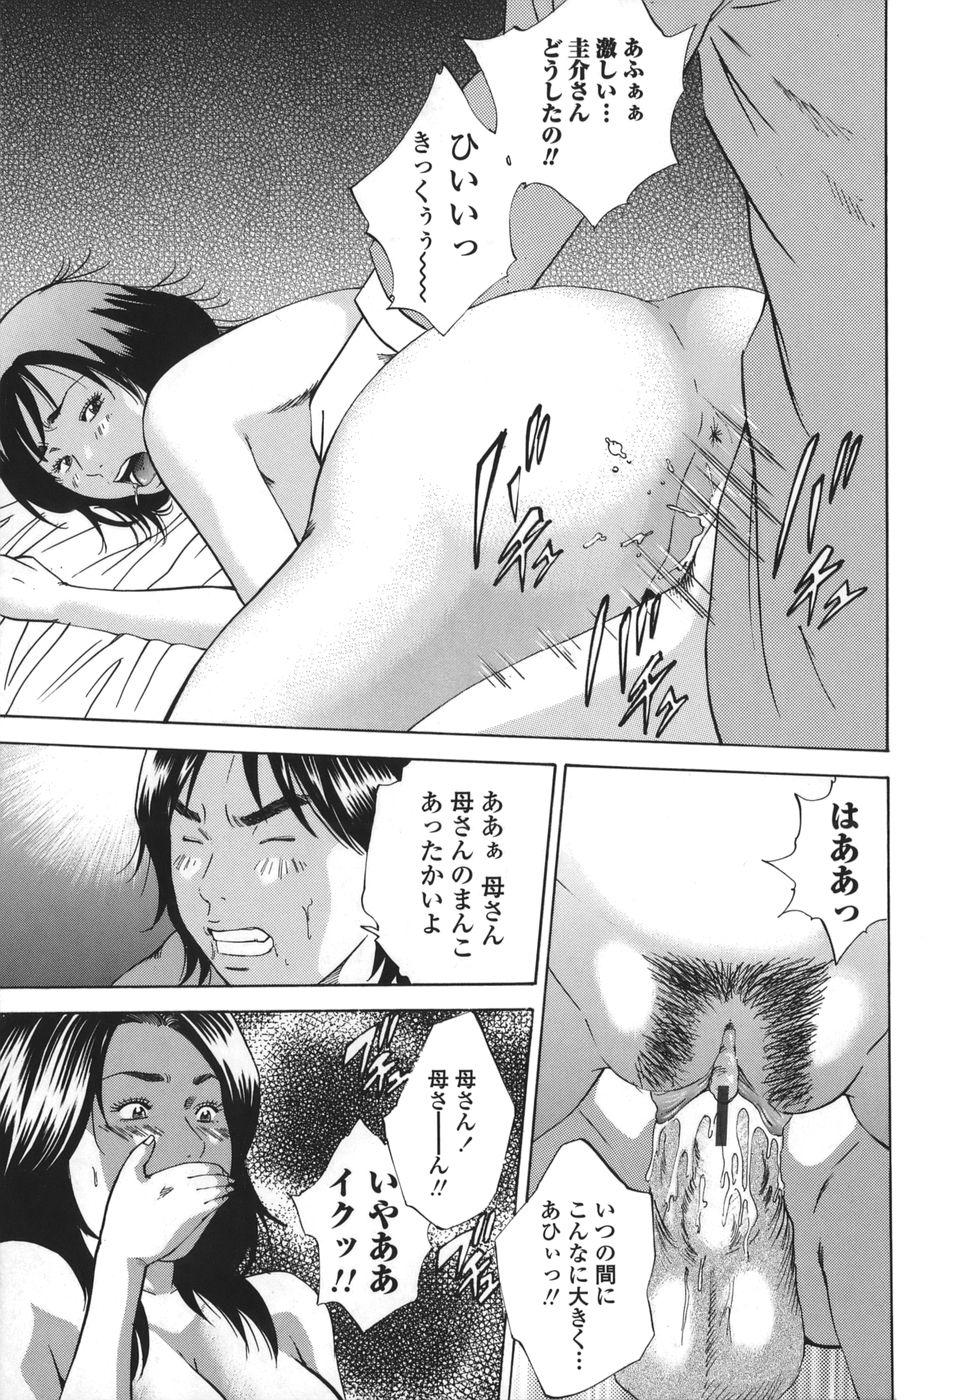 Kinshin Goukan - Near Relation Rapes 96